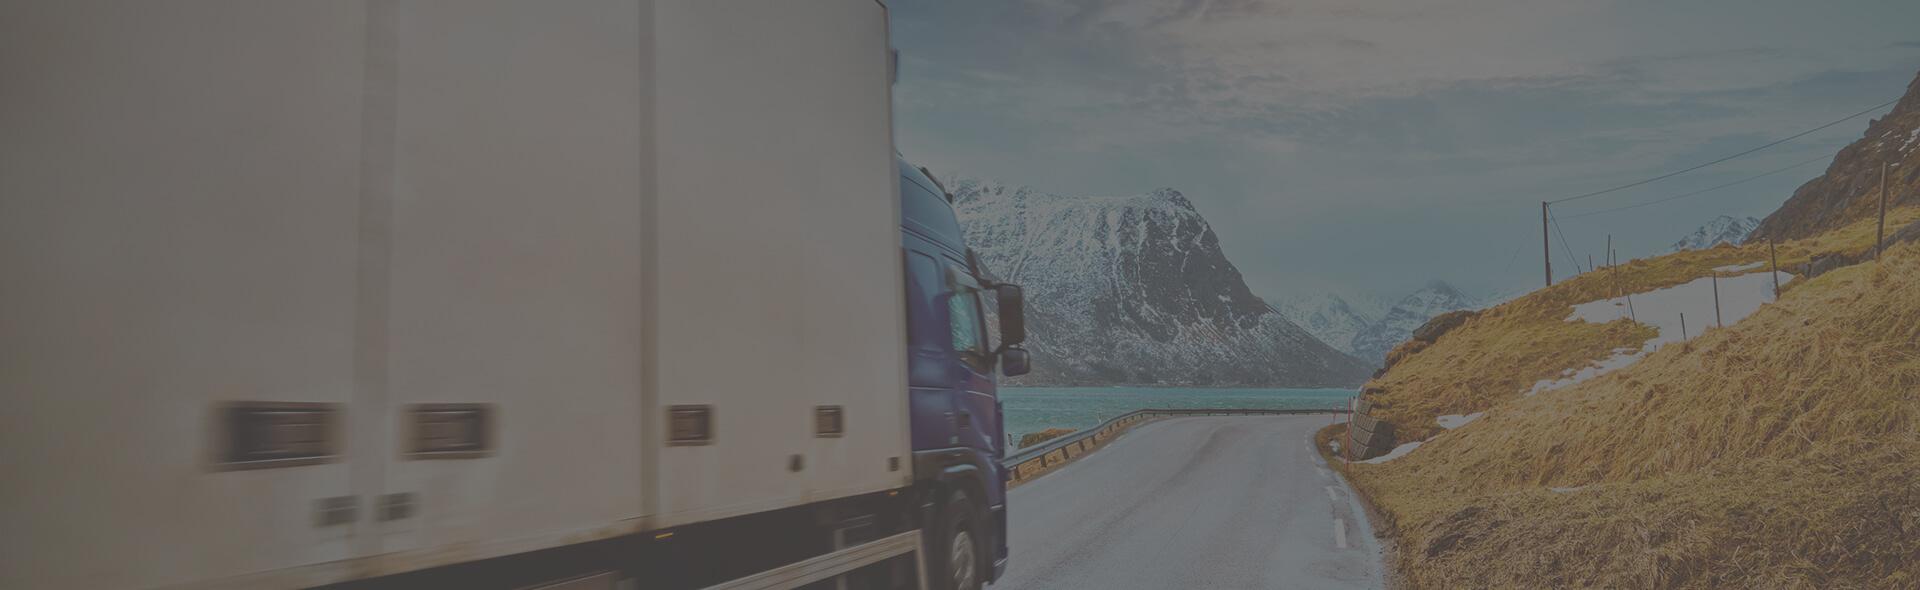 Збірні вантажі